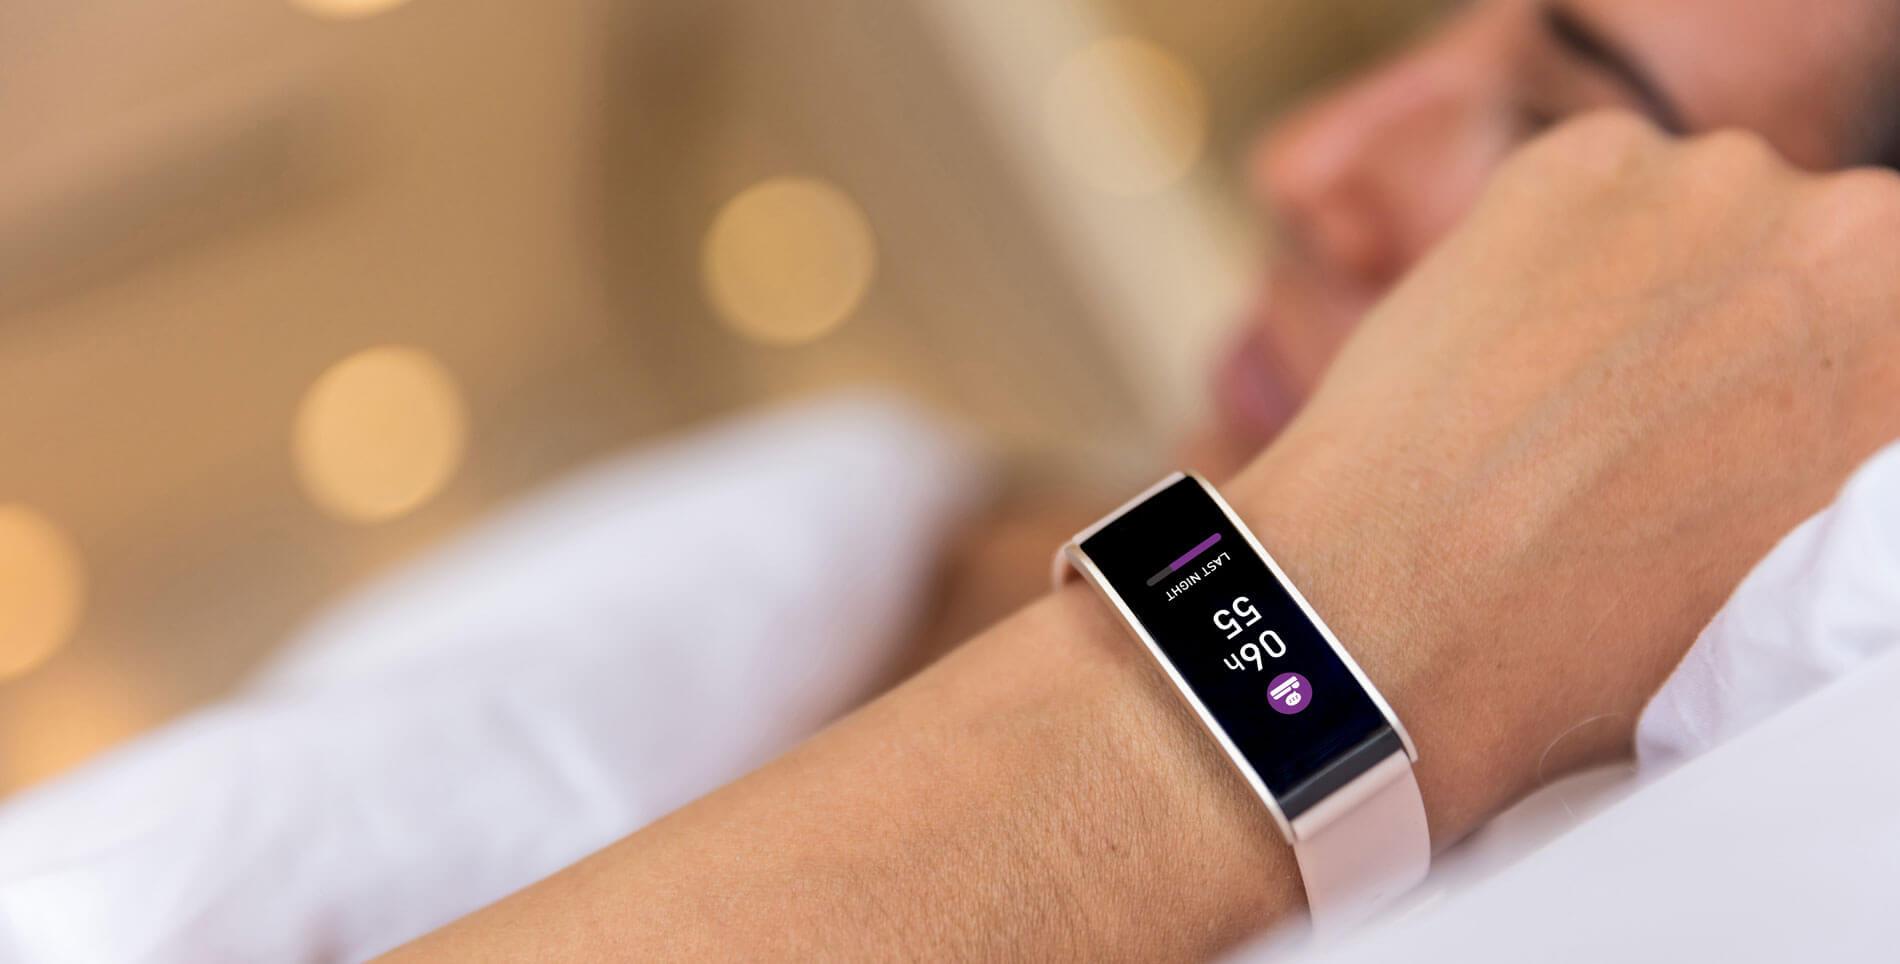 Sleep monitoring, record sleep time and quality